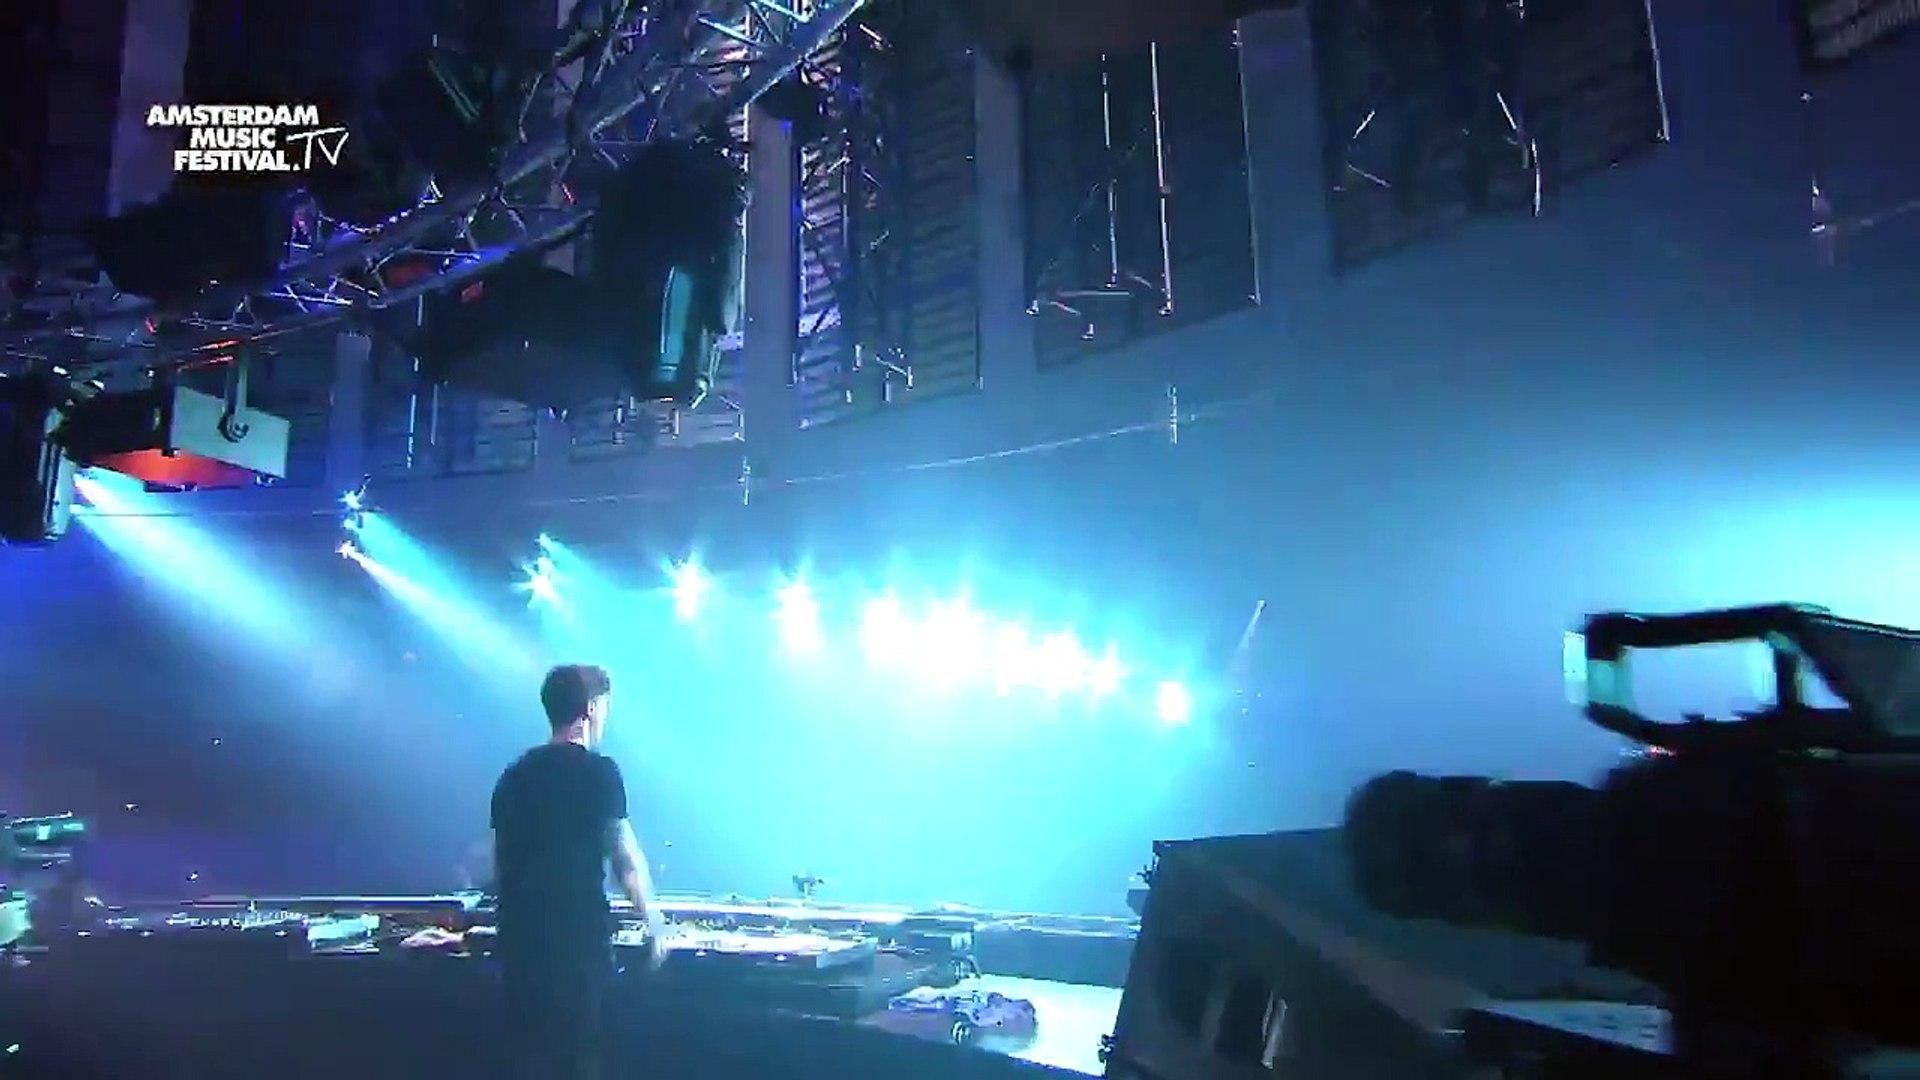 Martin Garrix Live at Amsterdam Music Festival 2015